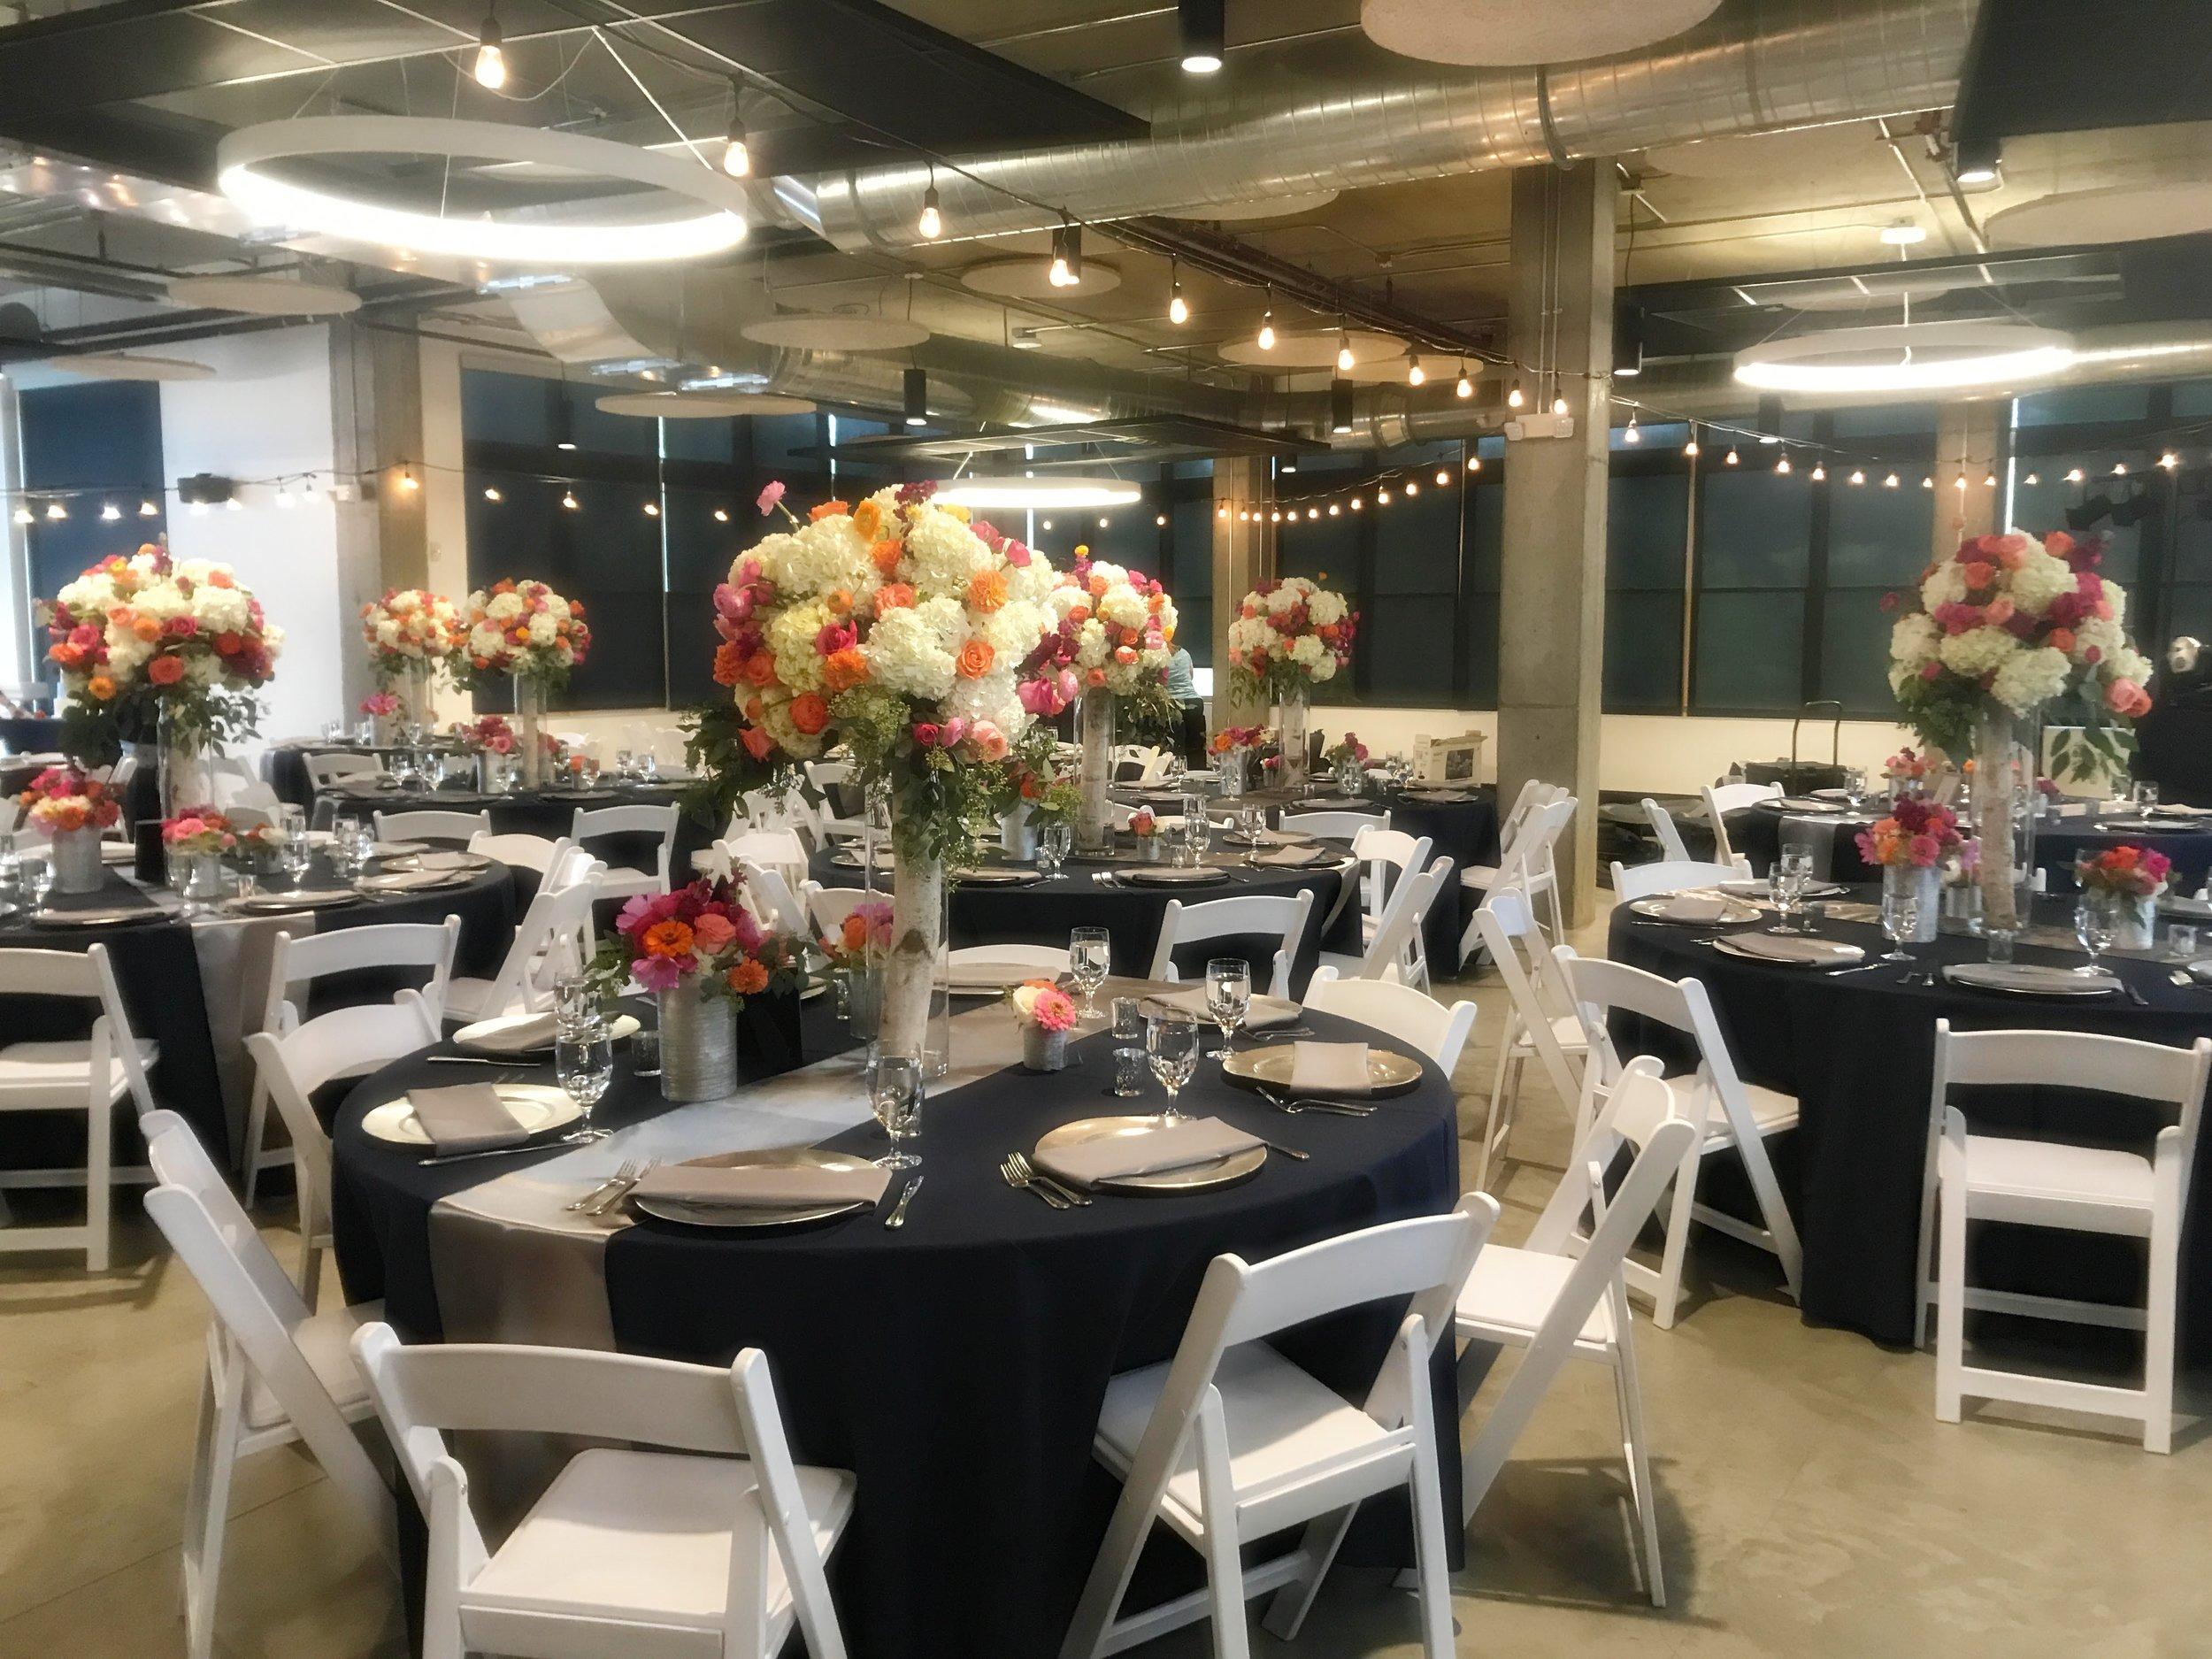 Wedding_Venue_Fort_Collins.jpg